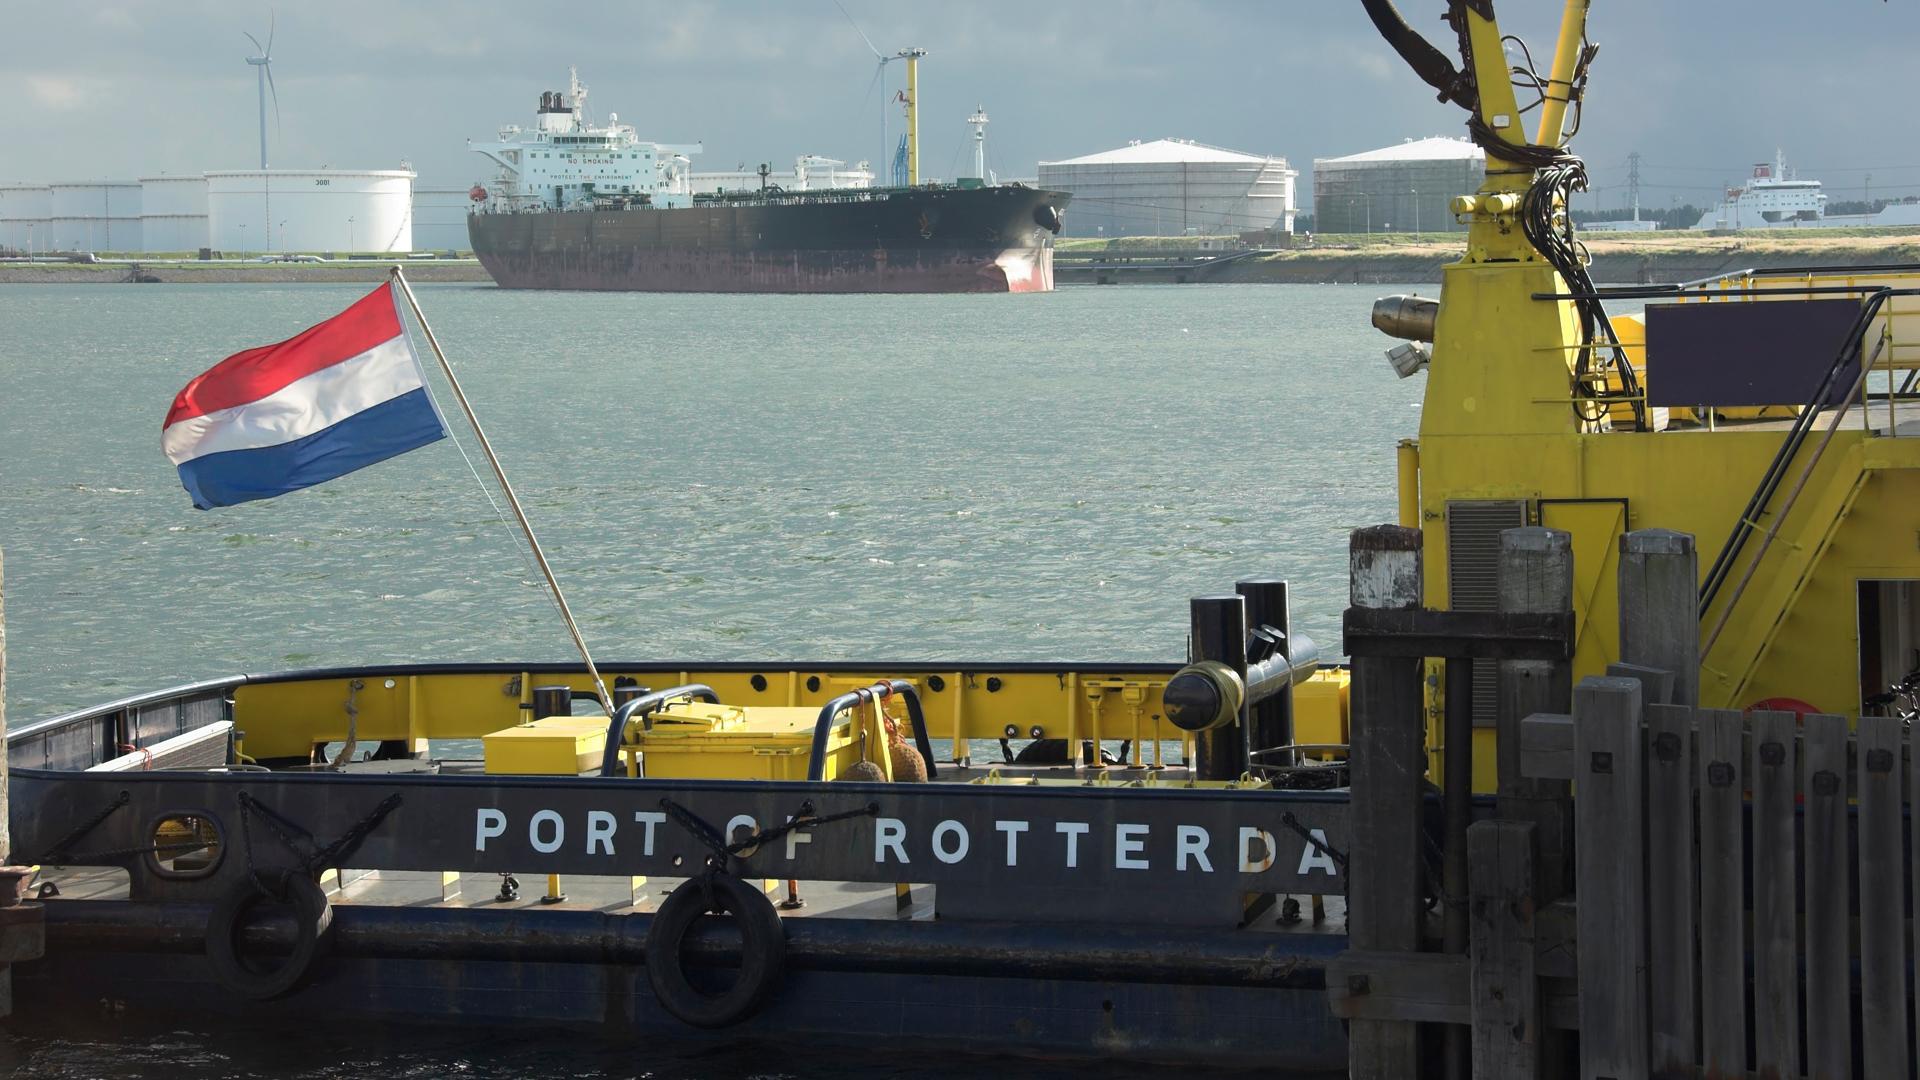 UWL - The Asset-Based Freight Forwarder - NVOCC - Port of Rotterdam